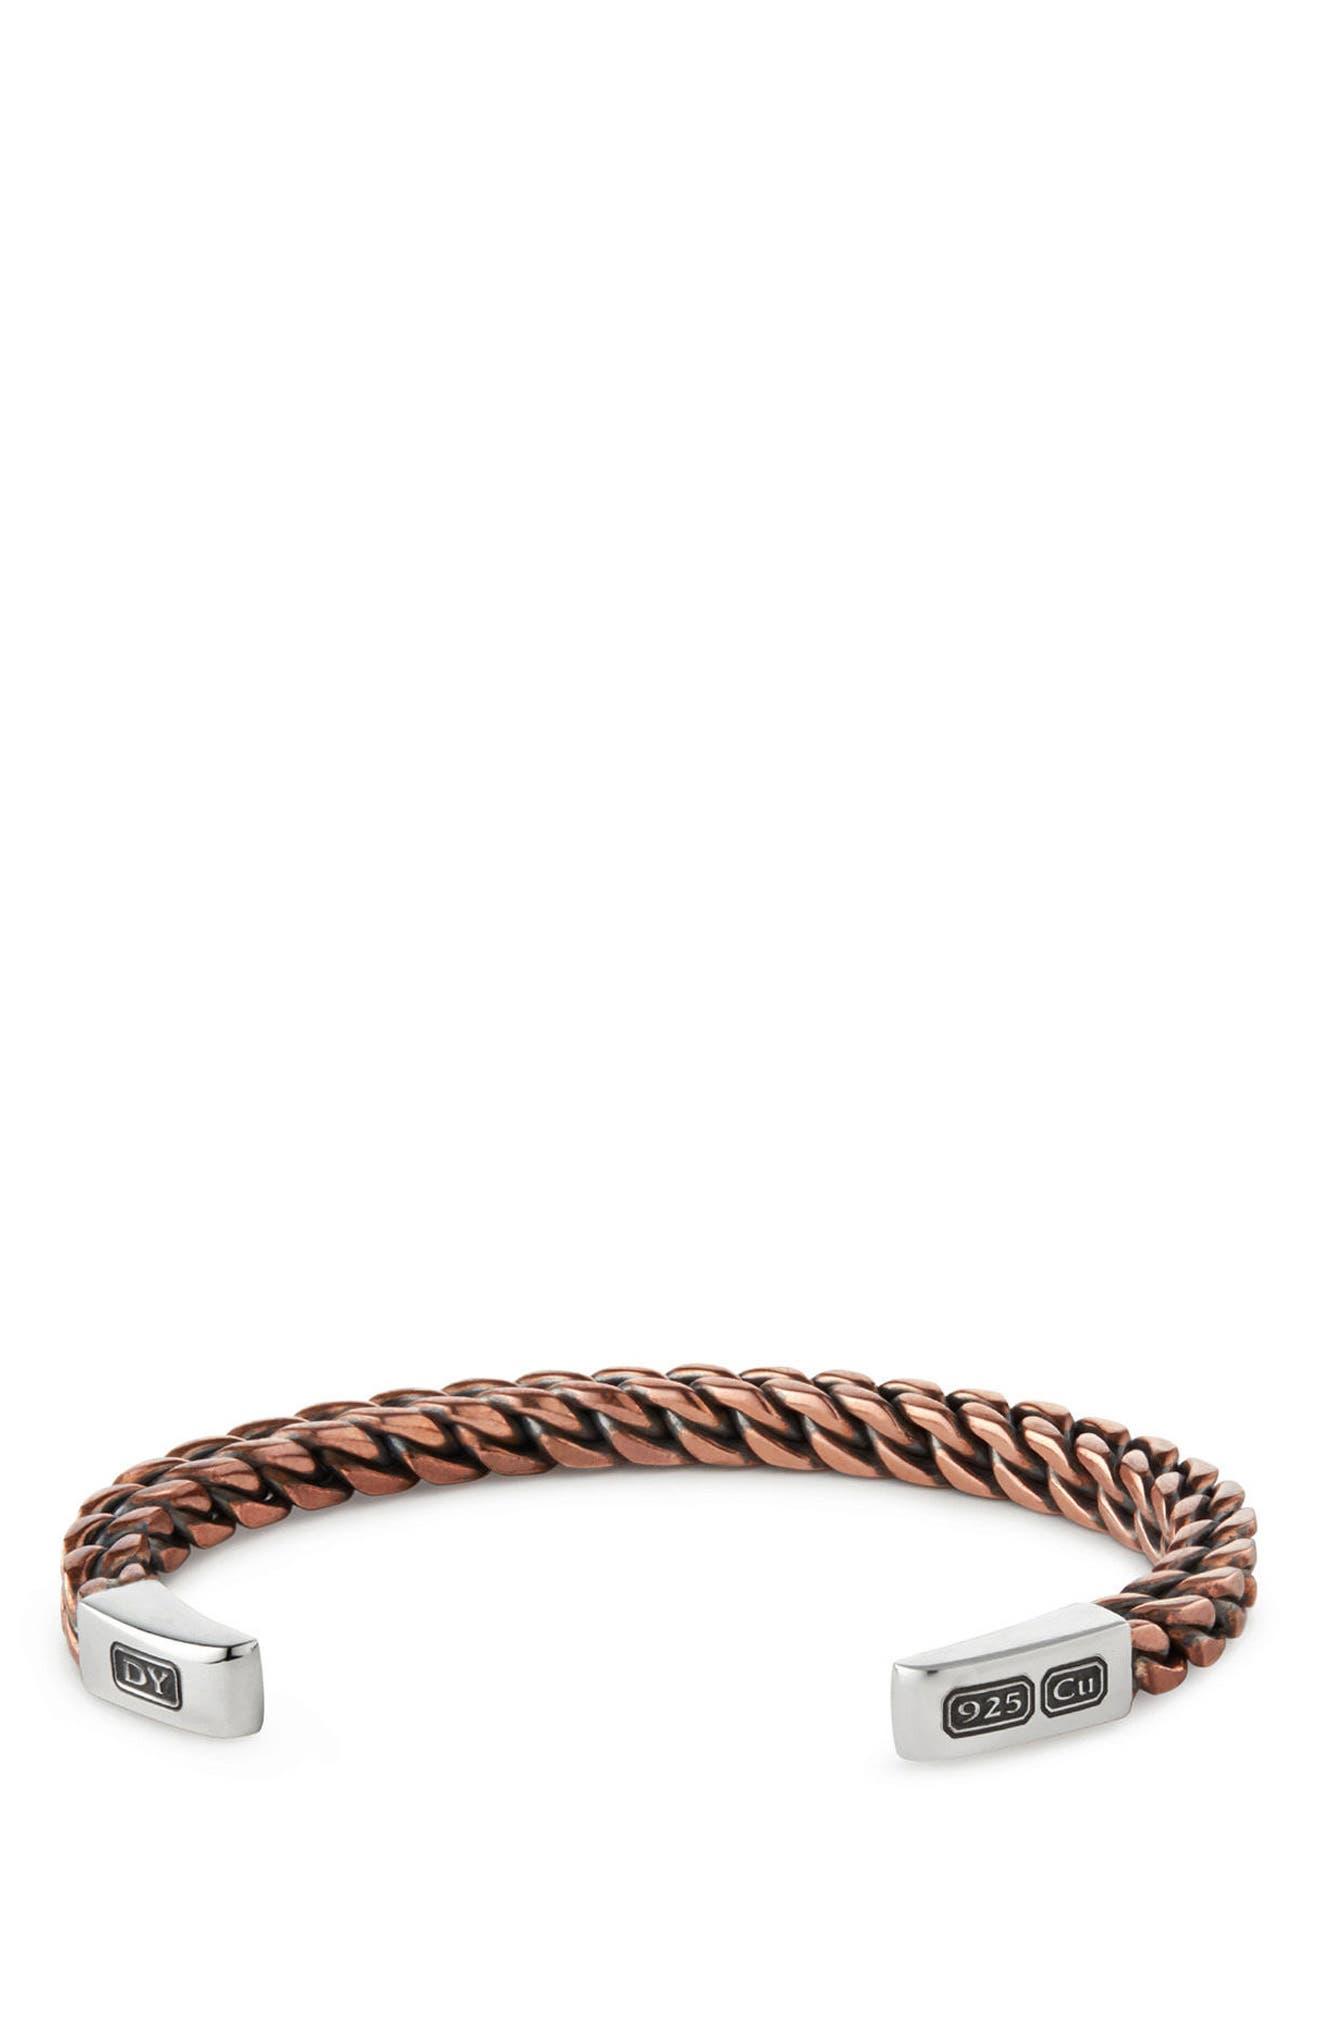 Main Image - David Yurman Woven Cuff Bracelet